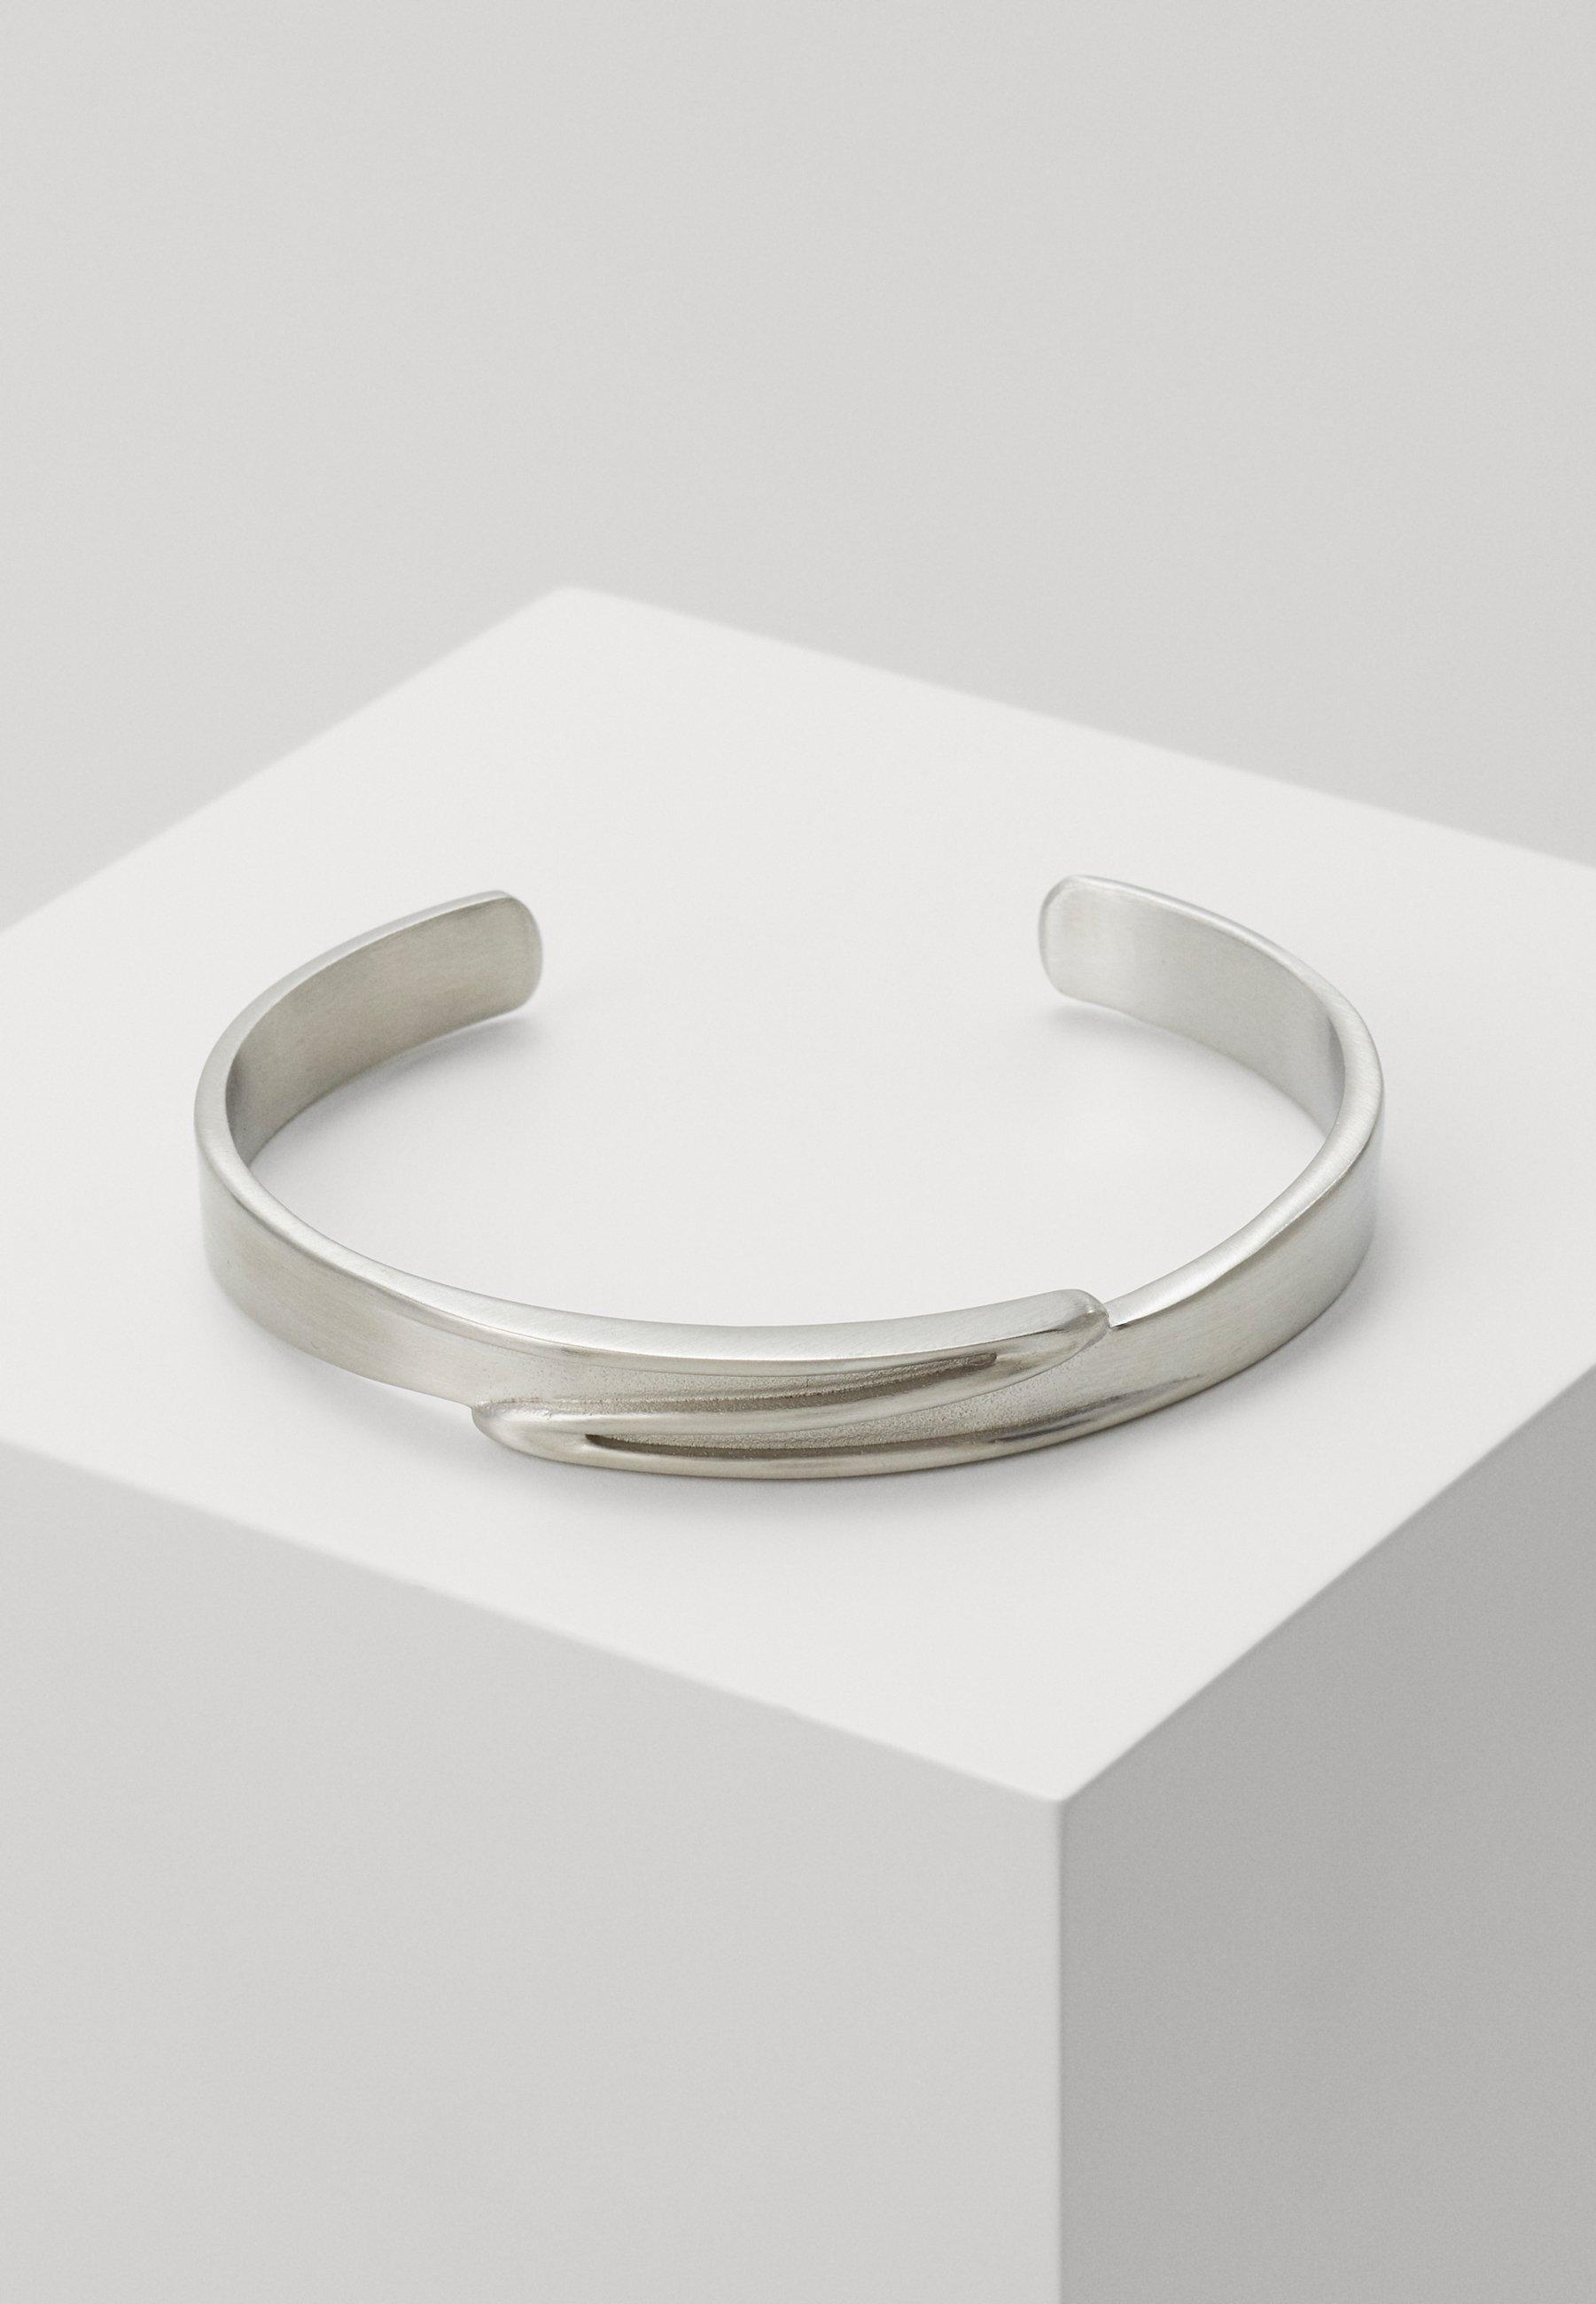 Men ZAHA HADID DESIGN - Bracelet